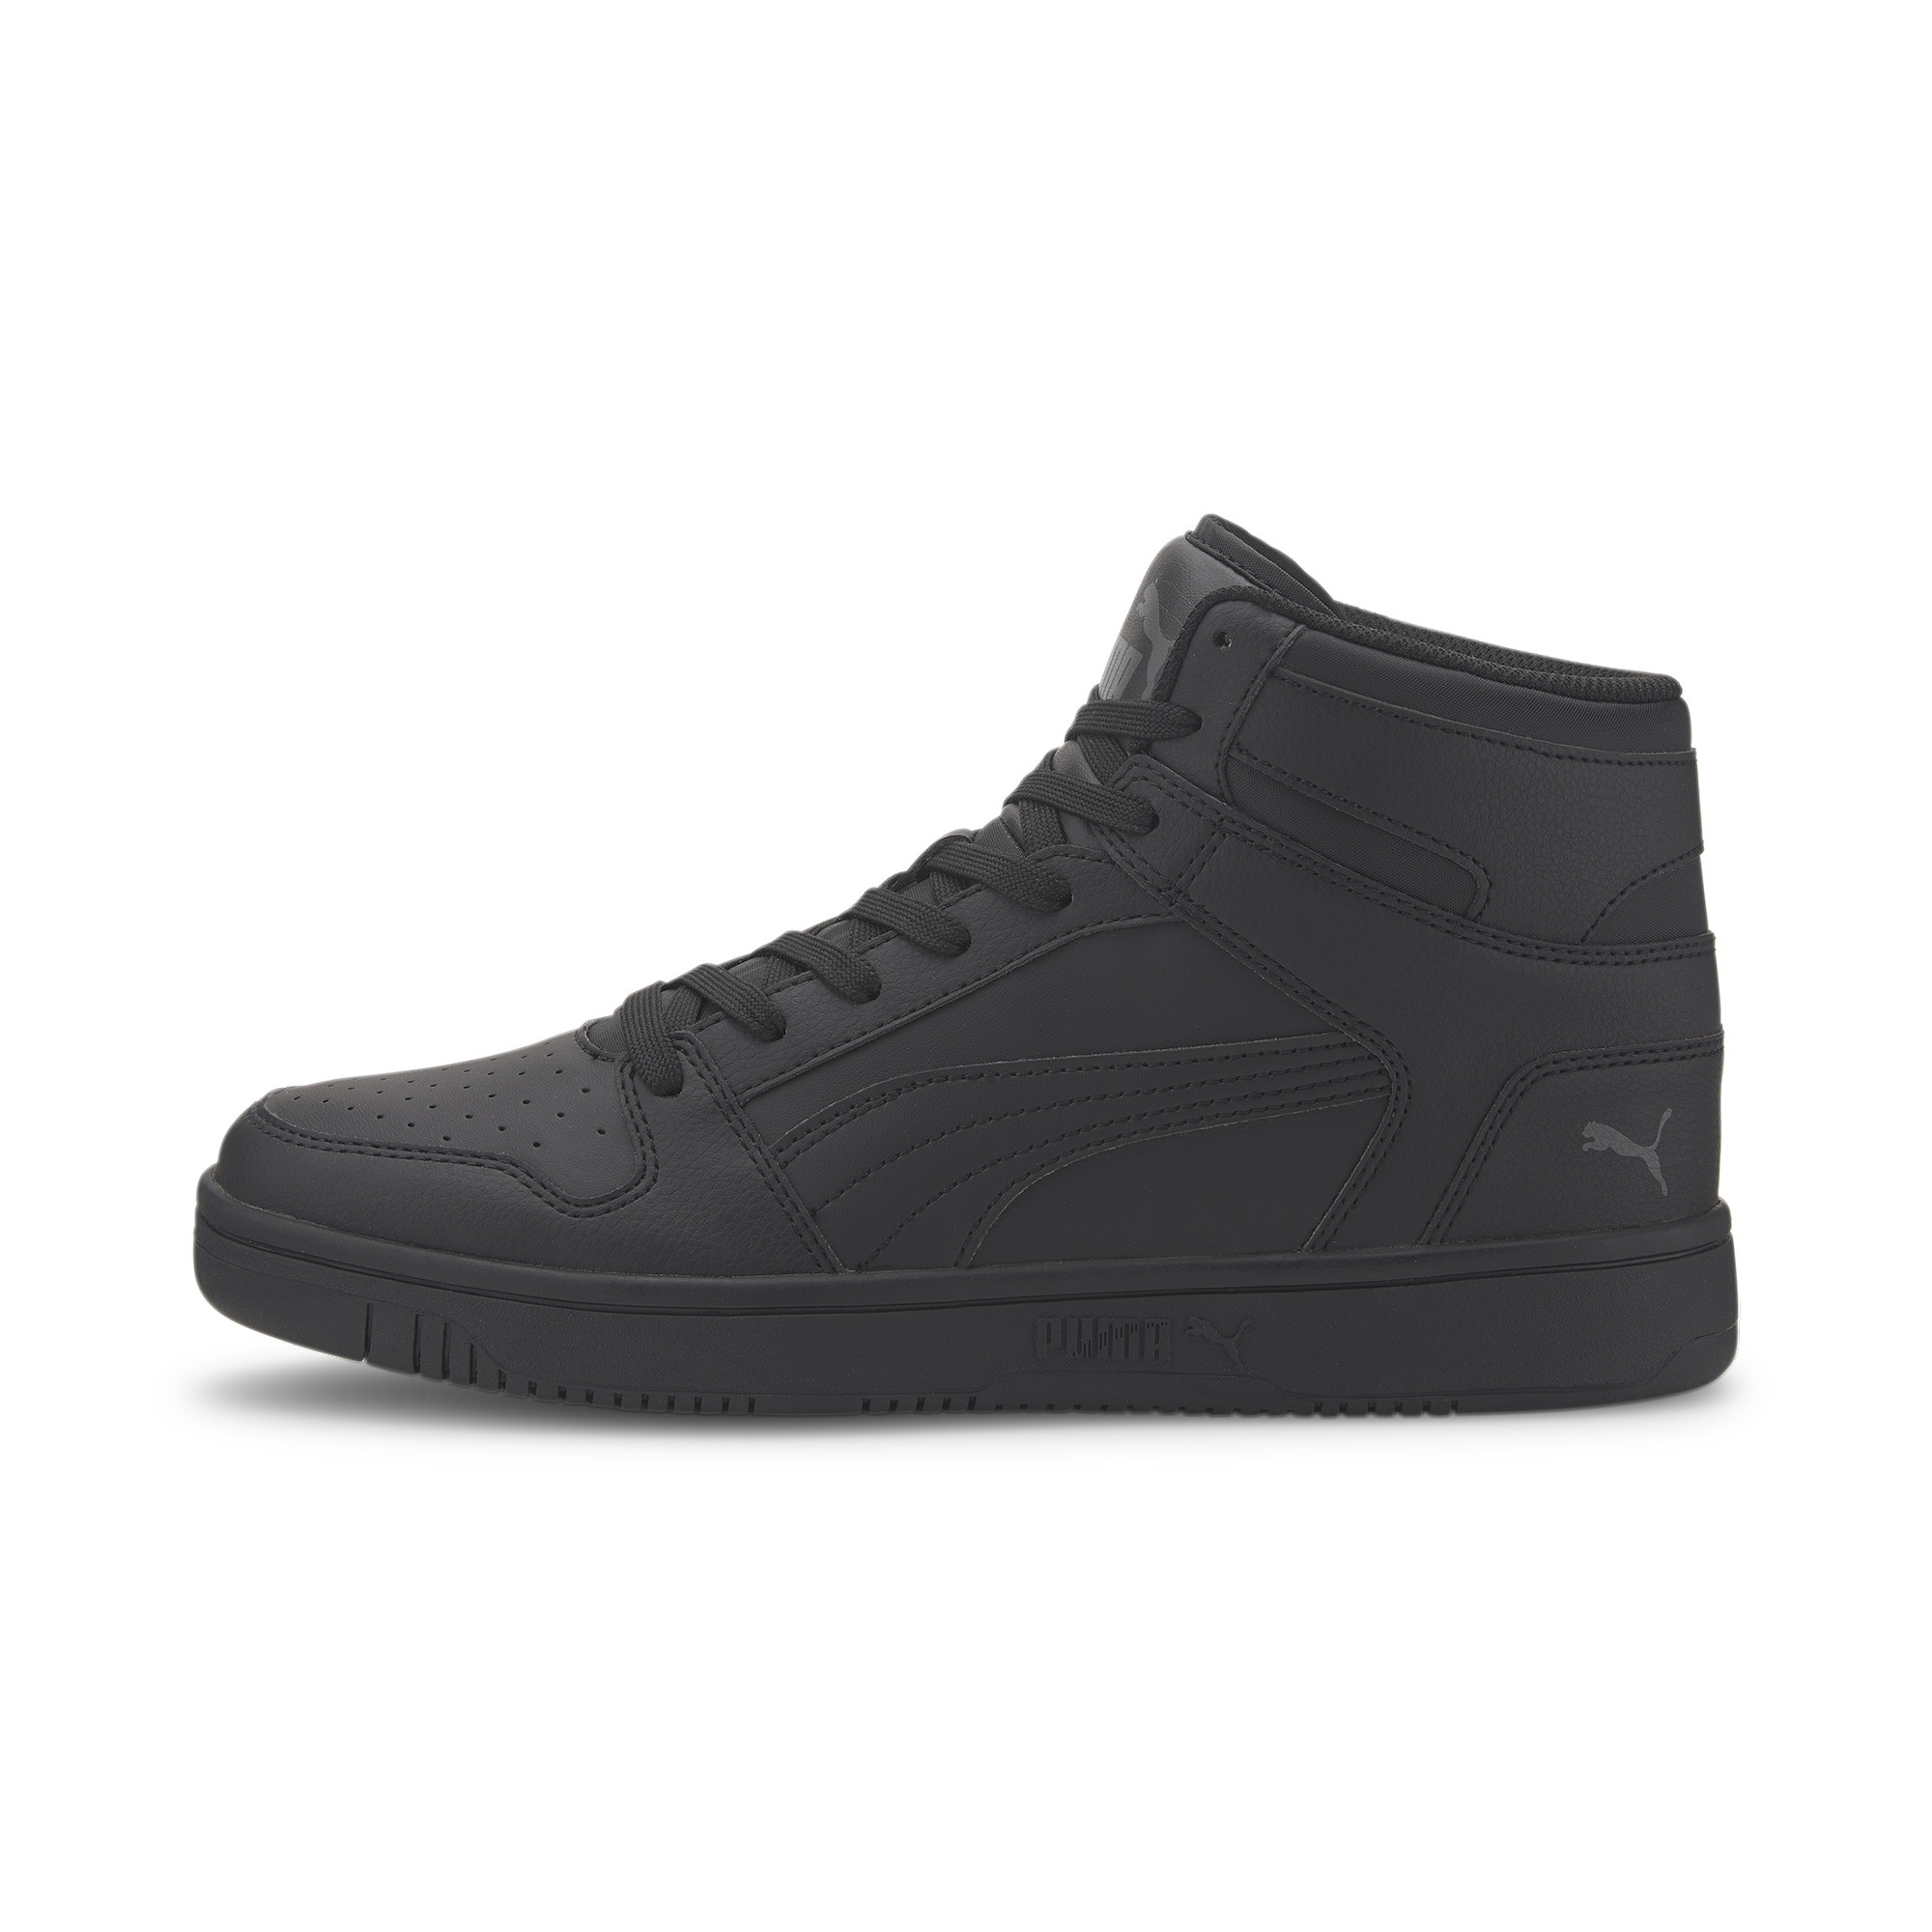 PUMA-PUMA-Rebound-LayUp-Men-039-s-Sneakers-Men-Mid-Boot-Basics thumbnail 27